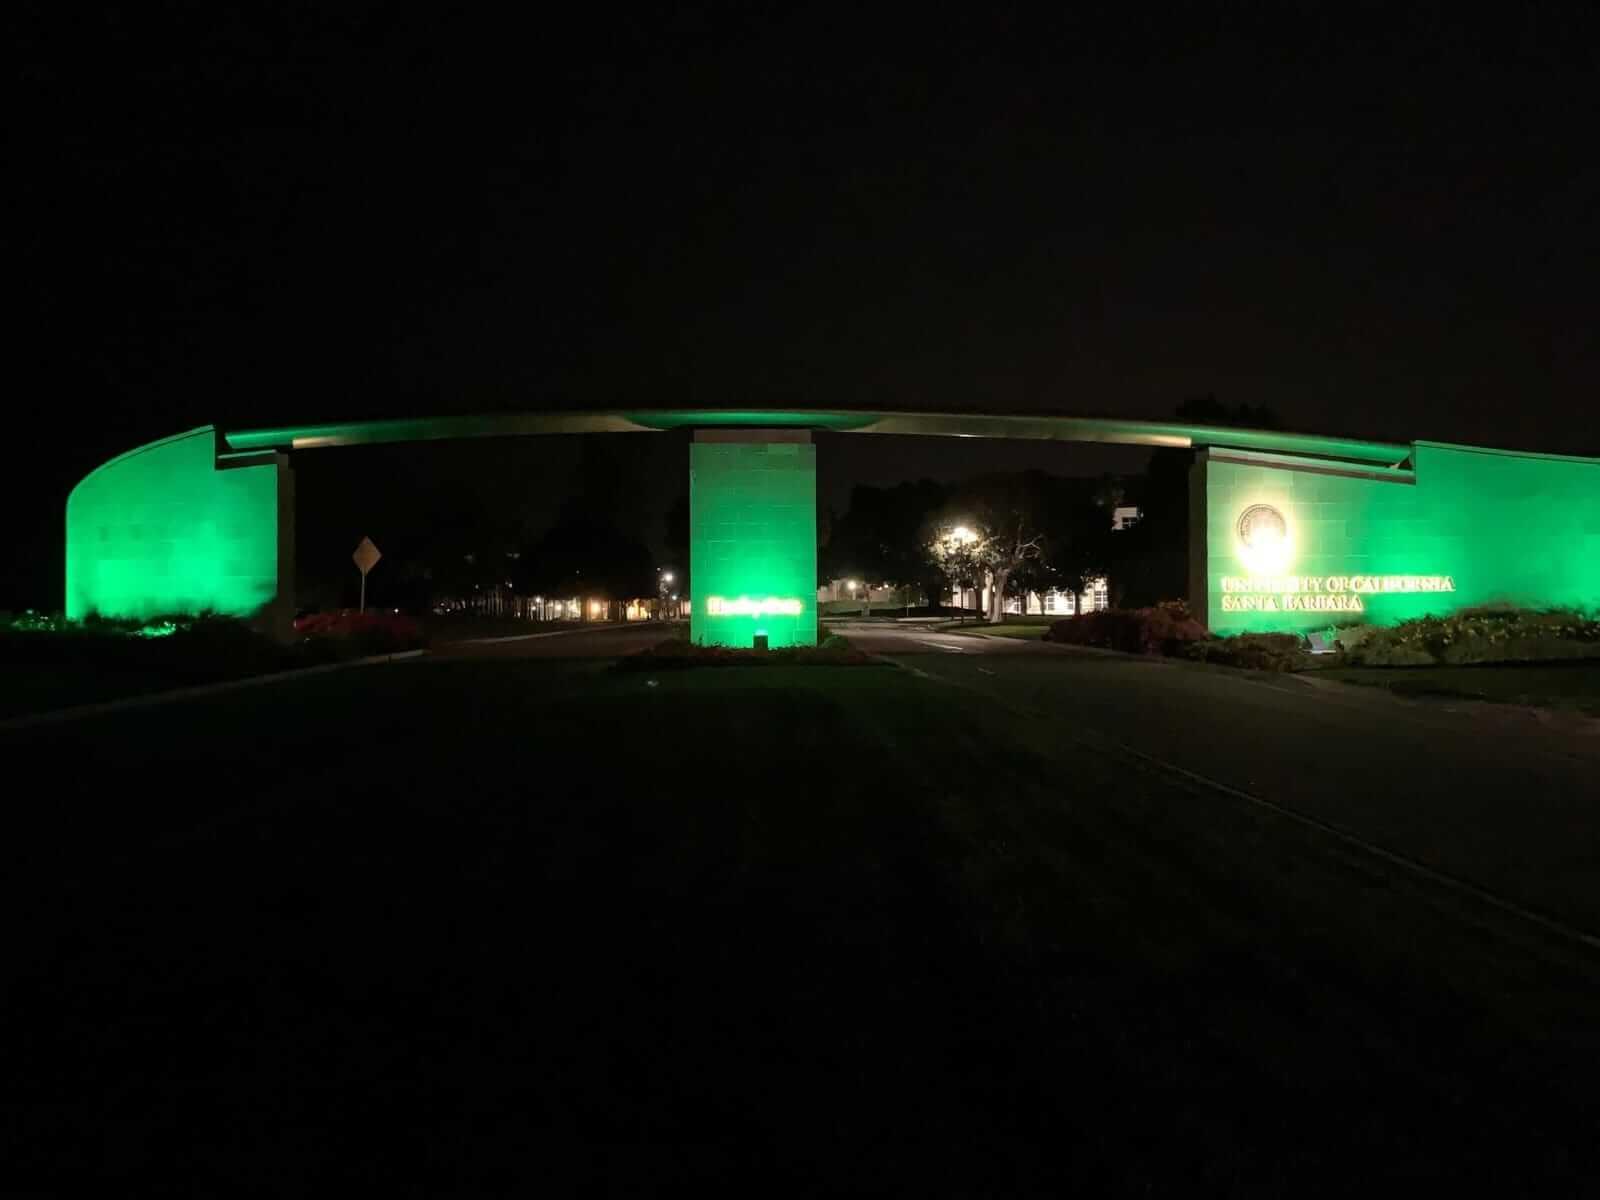 Hanley Gate lit up